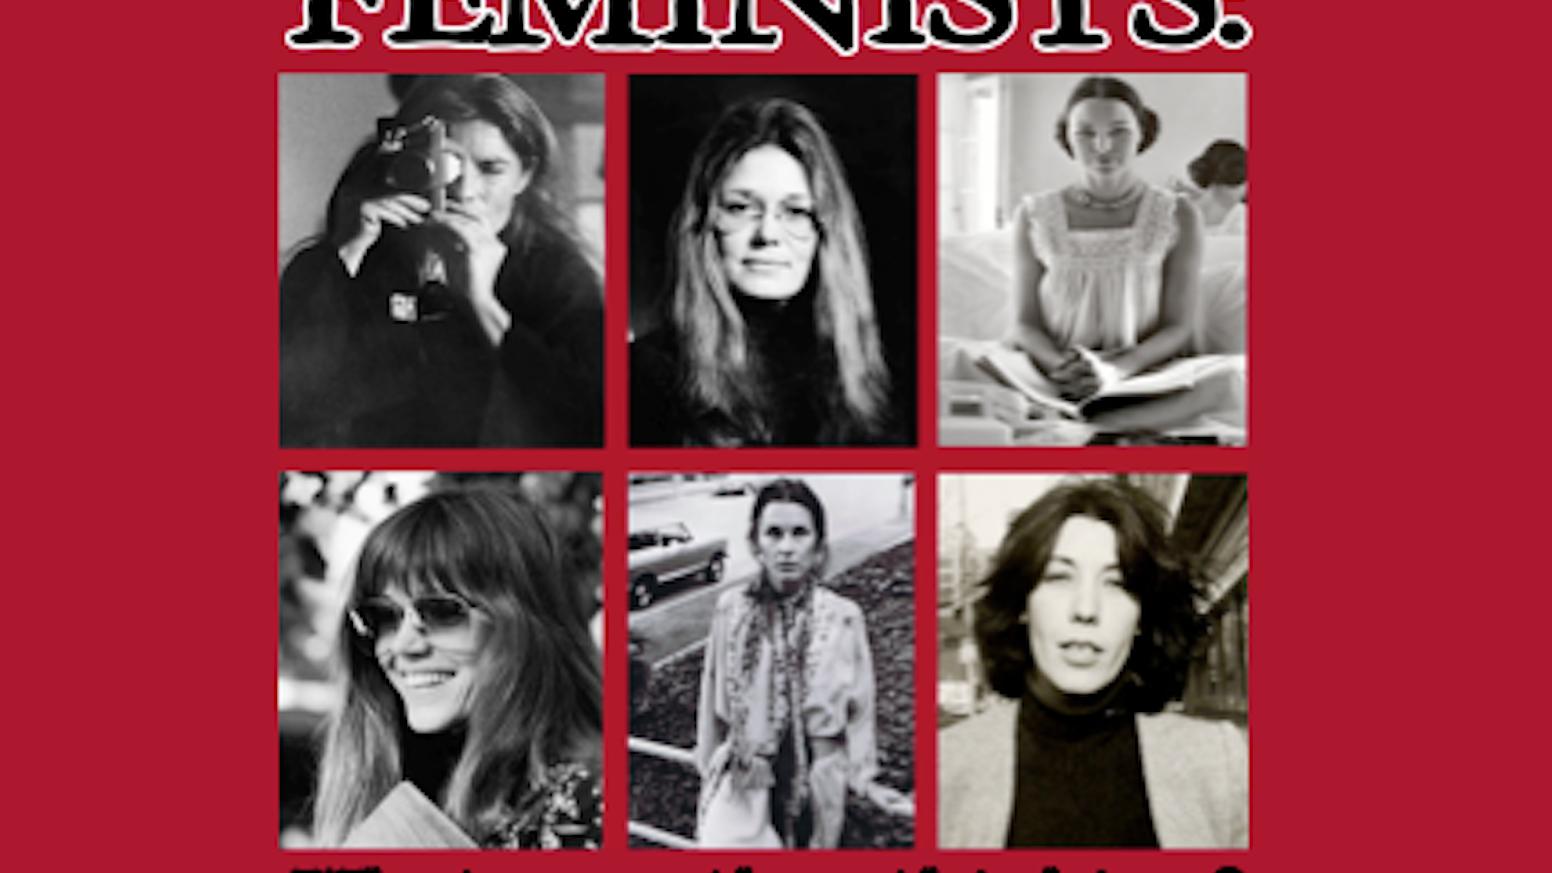 What Were They Thinking >> Feminists What Were They Thinking By Johanna Demetrakas Kickstarter